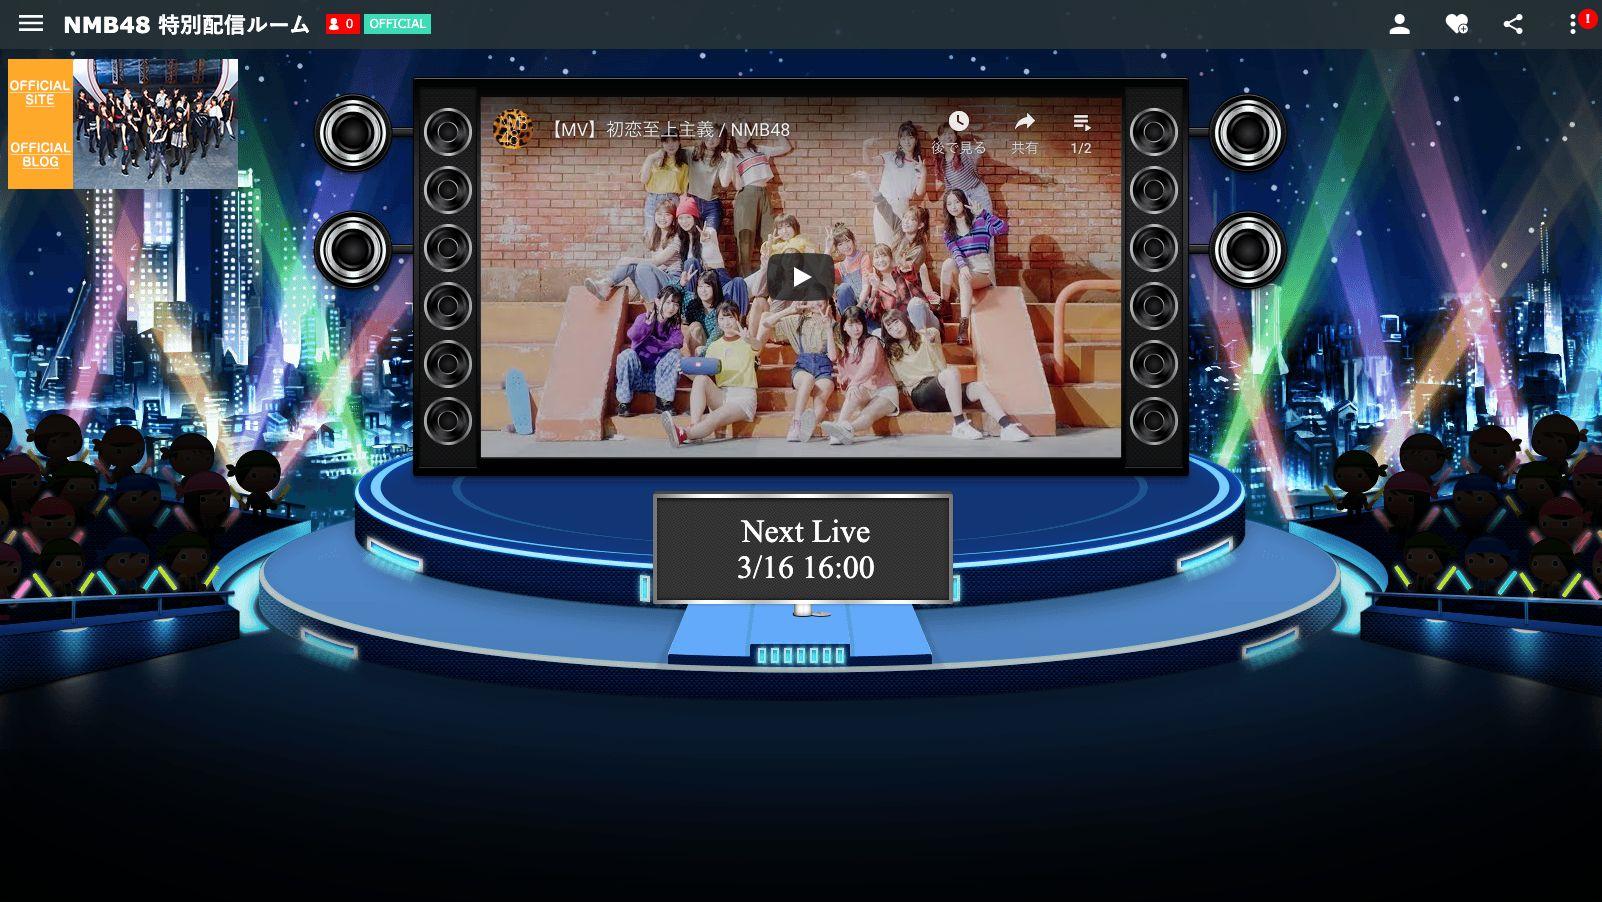 【NMB48】3月16日の16時からSHOWROOMで「NMB48 D3vs6K」が配信